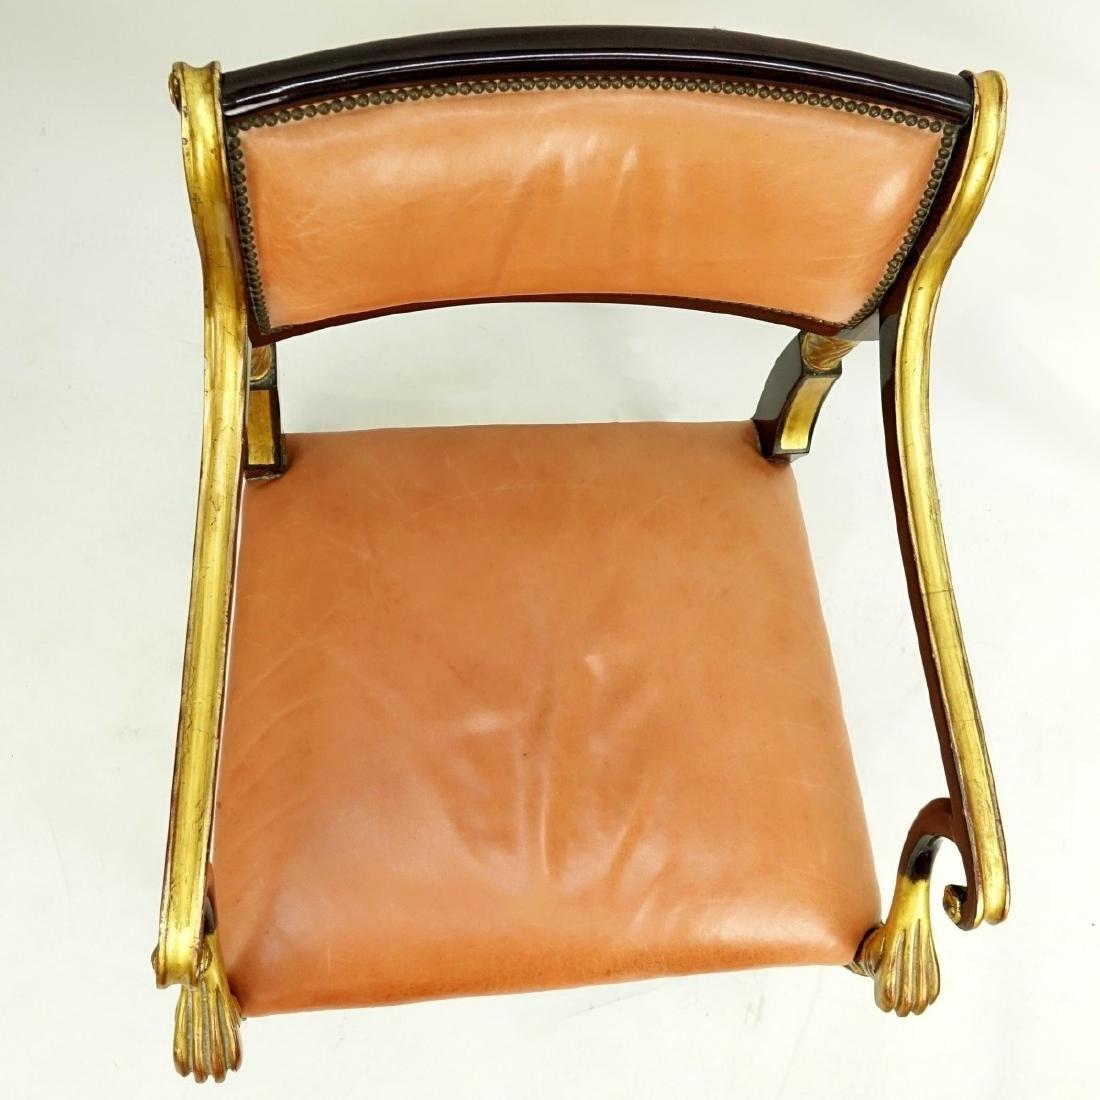 Regency style Arm Chair - 3